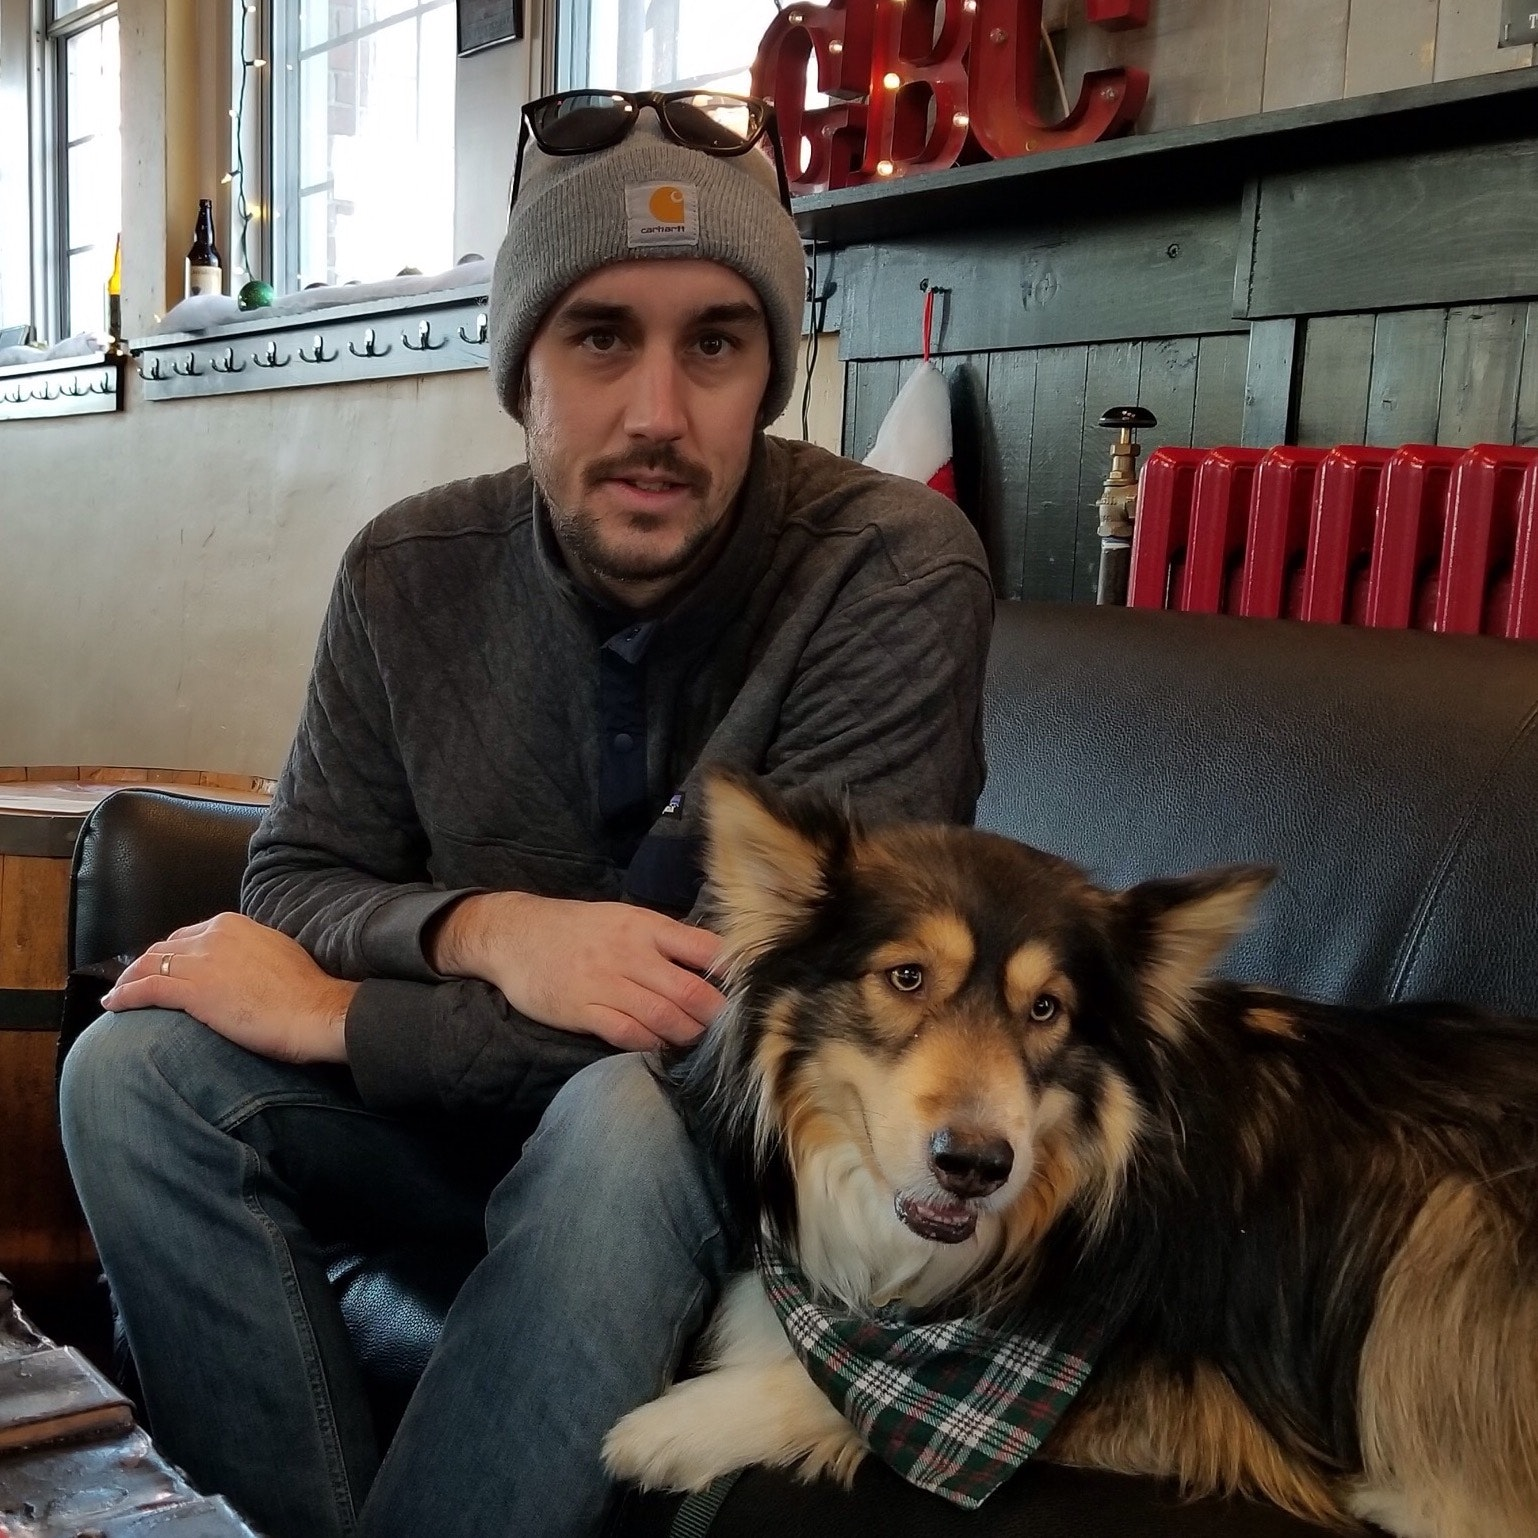 Chris's dog boarding